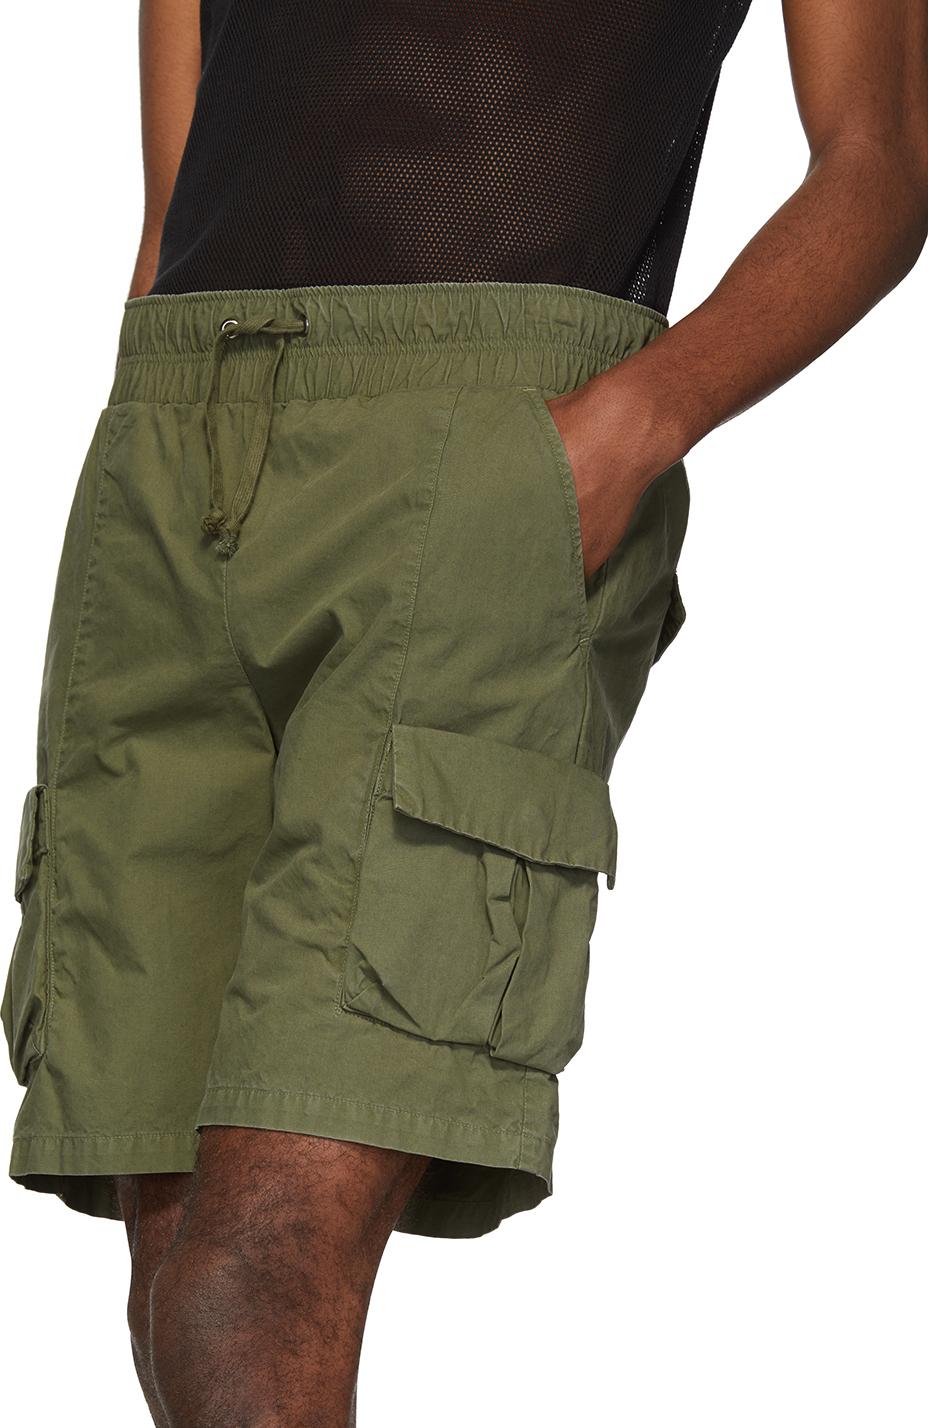 John Elliott Shorts Green Military Cargo Shorts